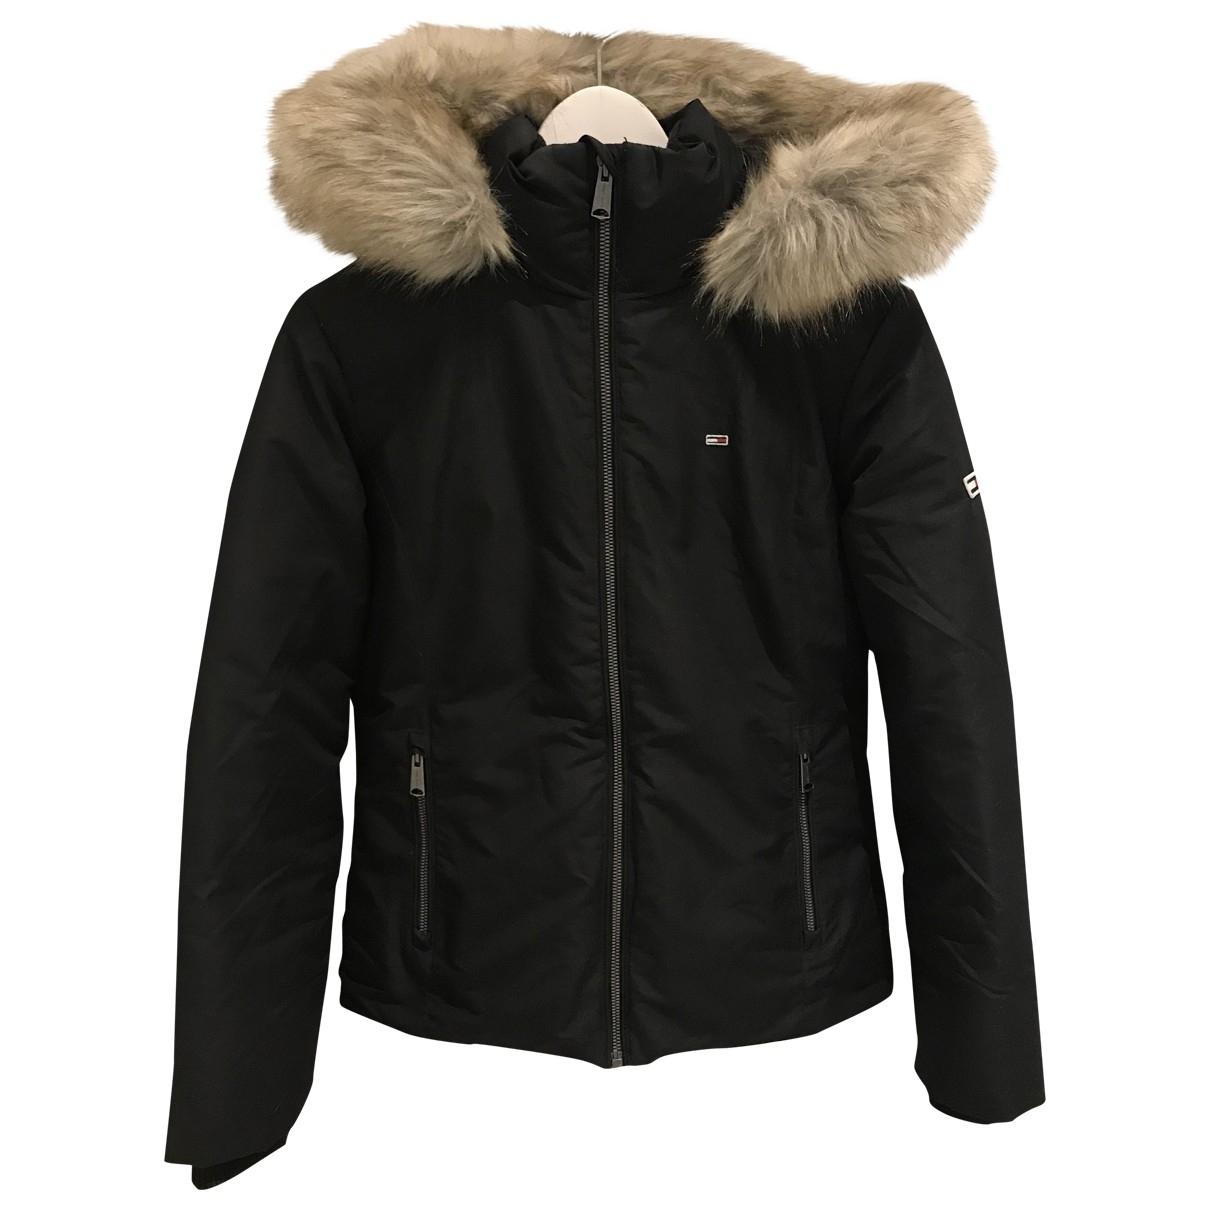 Tommy Hilfiger \N Black Cotton jacket for Women S International